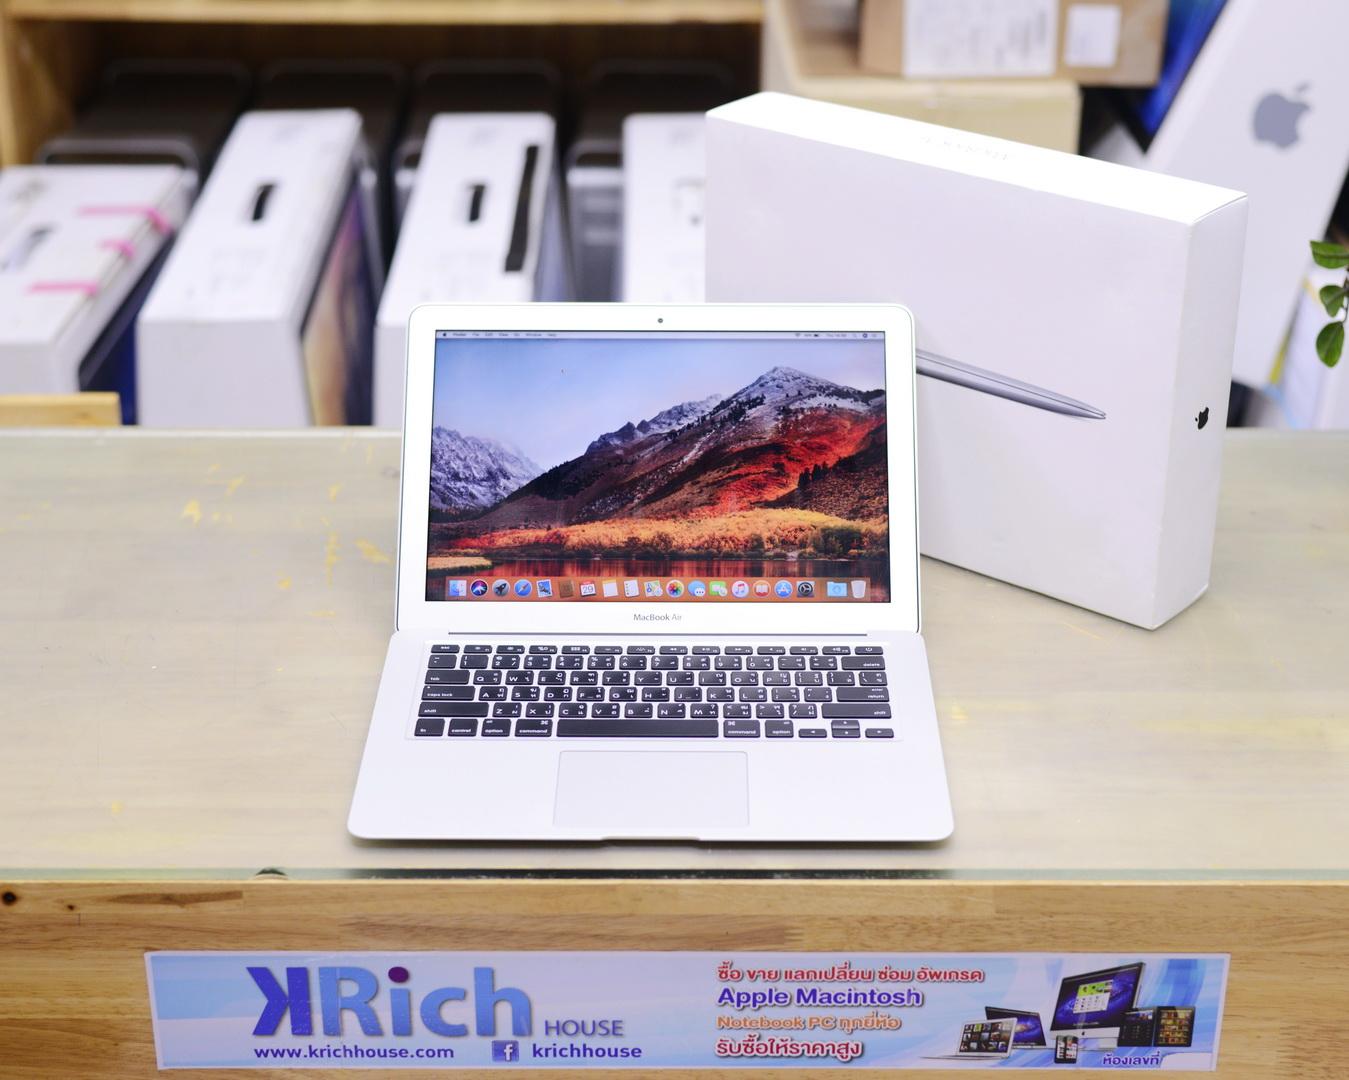 MacBook Air (13-inch, Early 2015) - Core i5 1.6GHz RAM 8GB SSD 128GB - FullBox